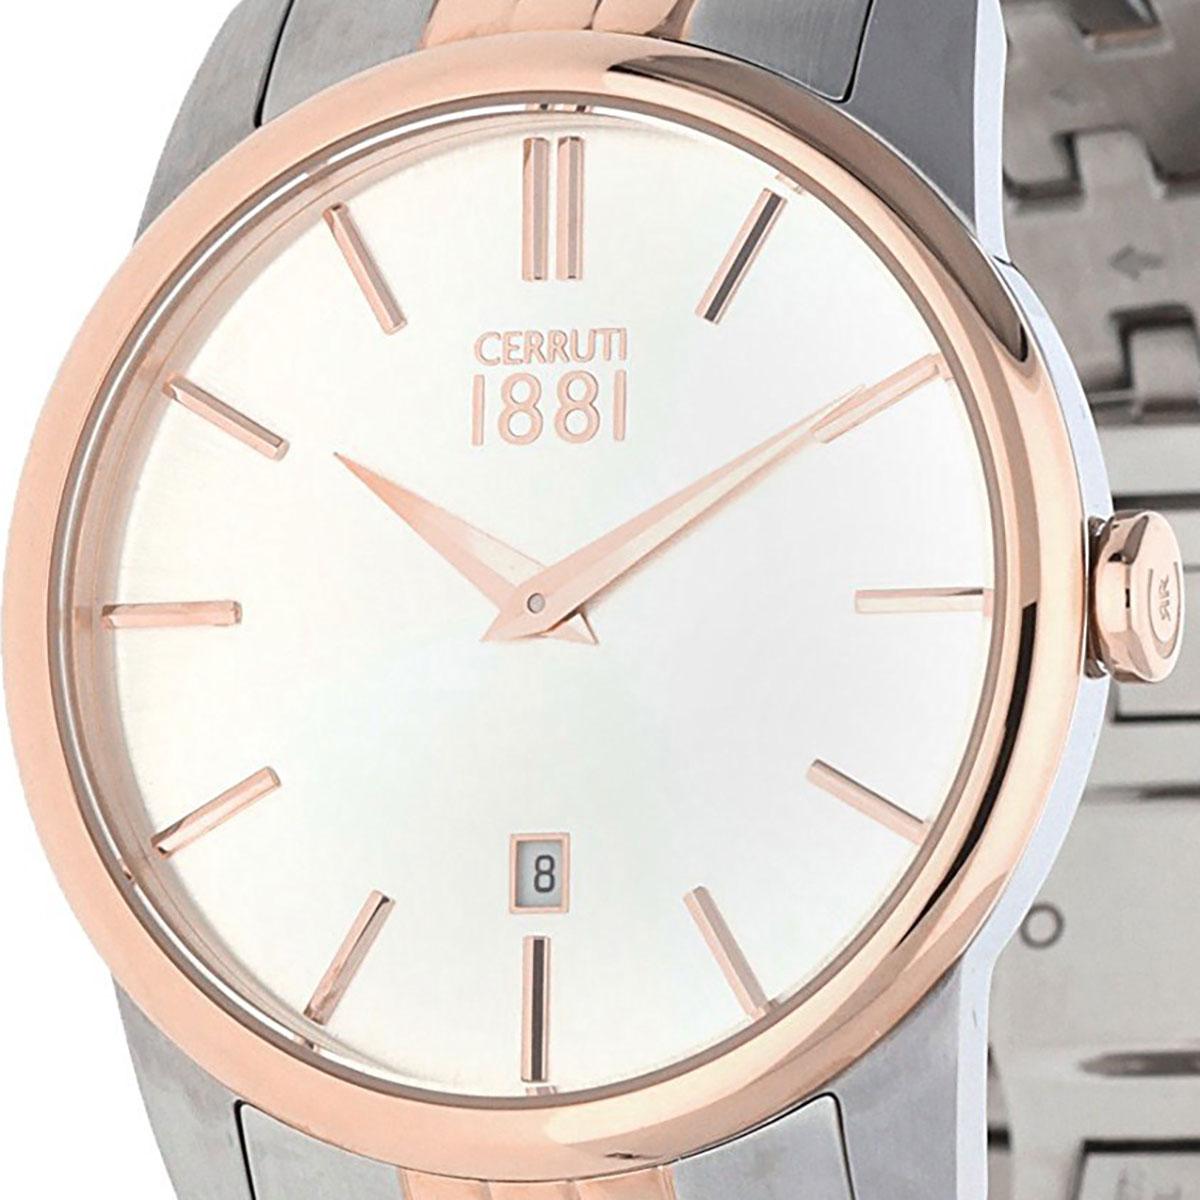 CERRUTI 1881 チェルッティ1881 電池式クォーツ 腕時計 [CRA117STR07MRT] 並行輸入品 ゴールド(金)